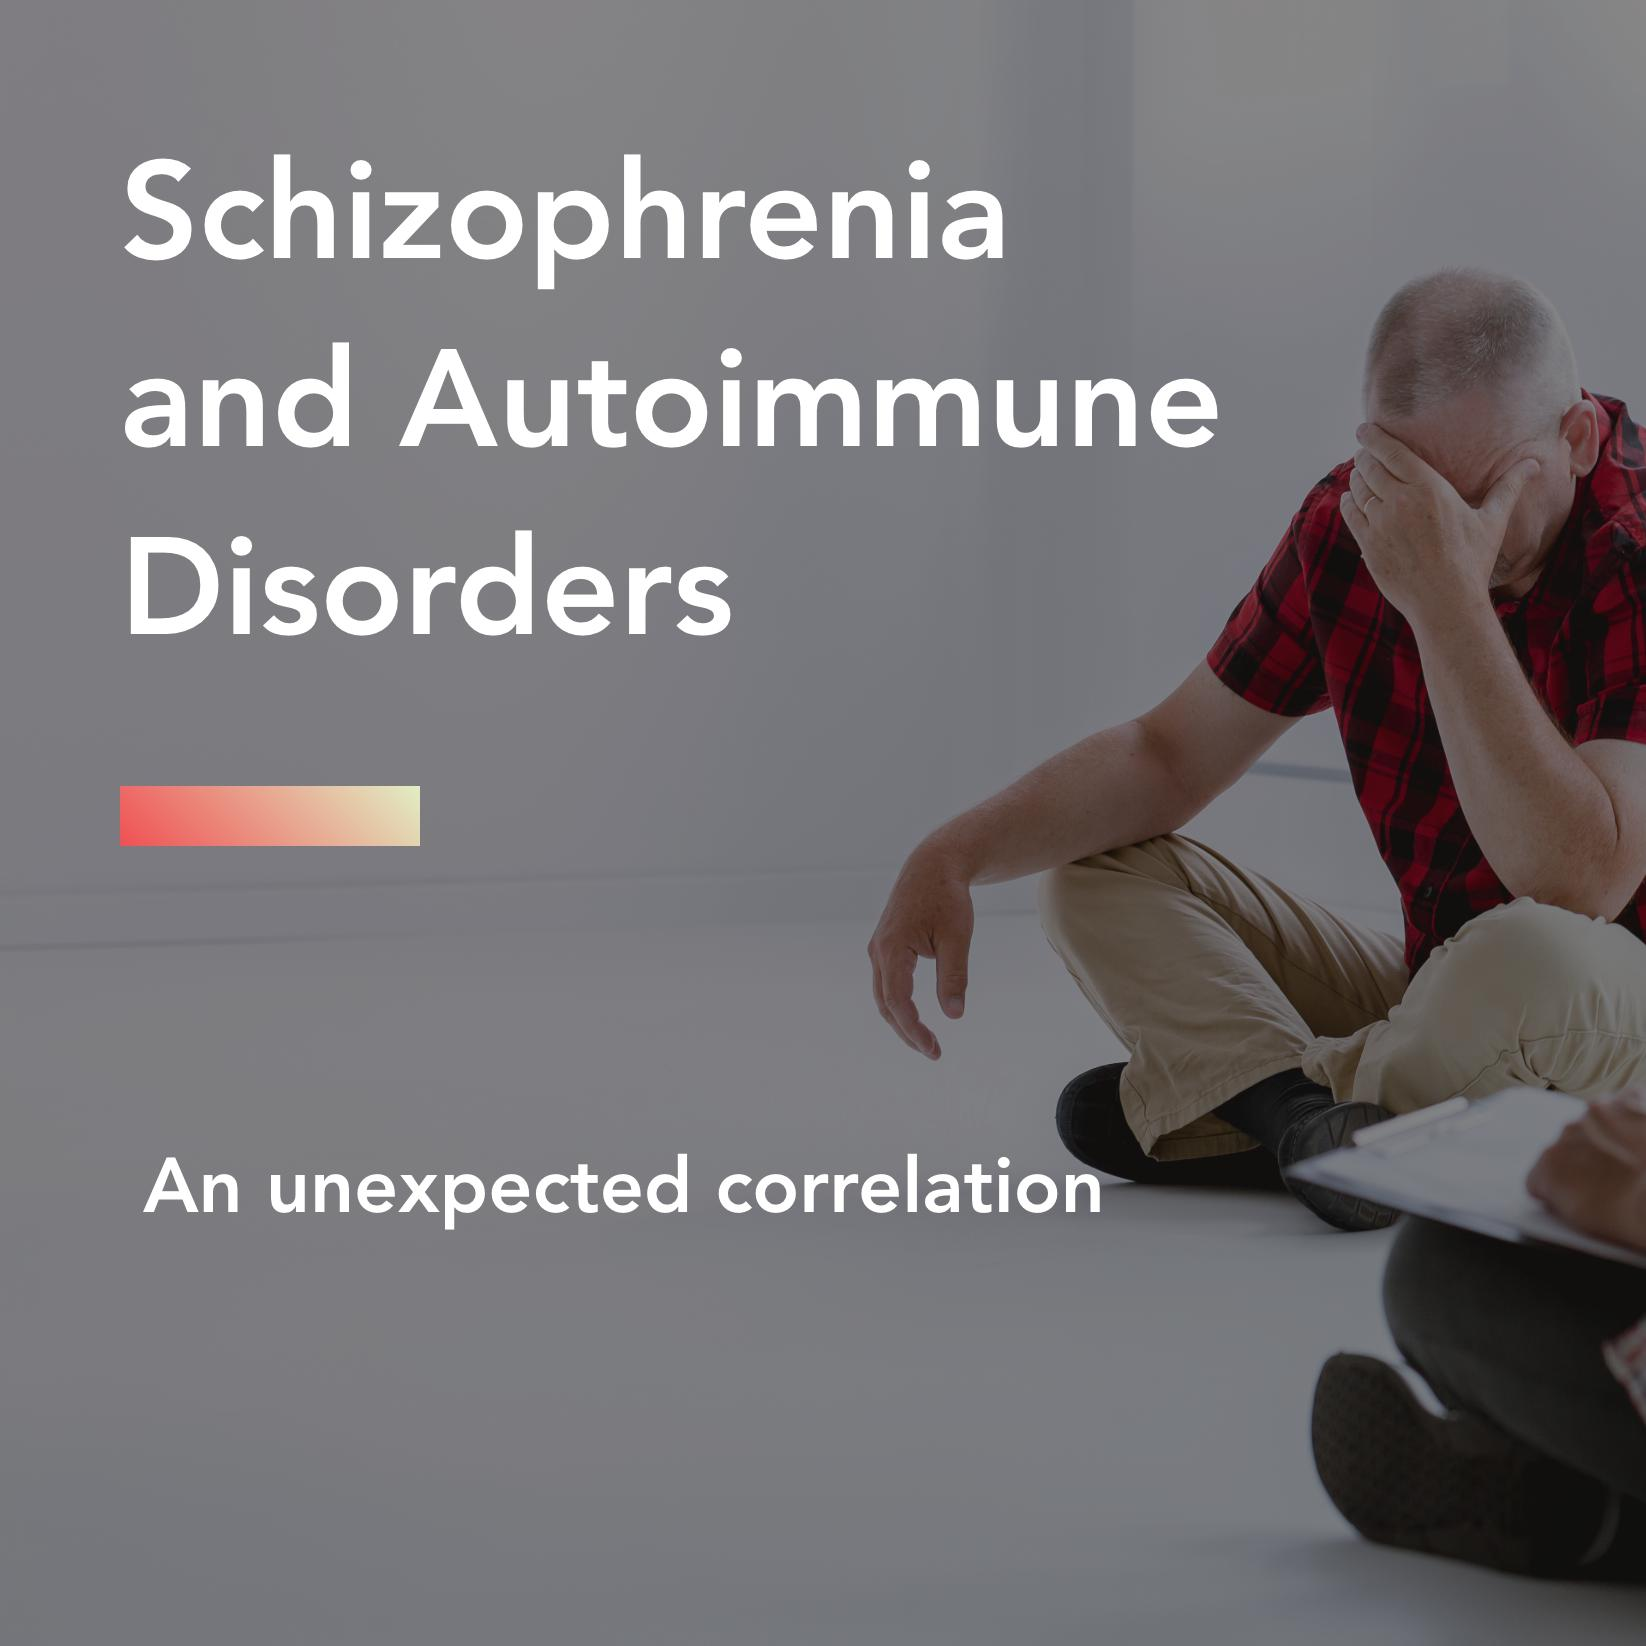 schizophrenia and autoimmune disorders title